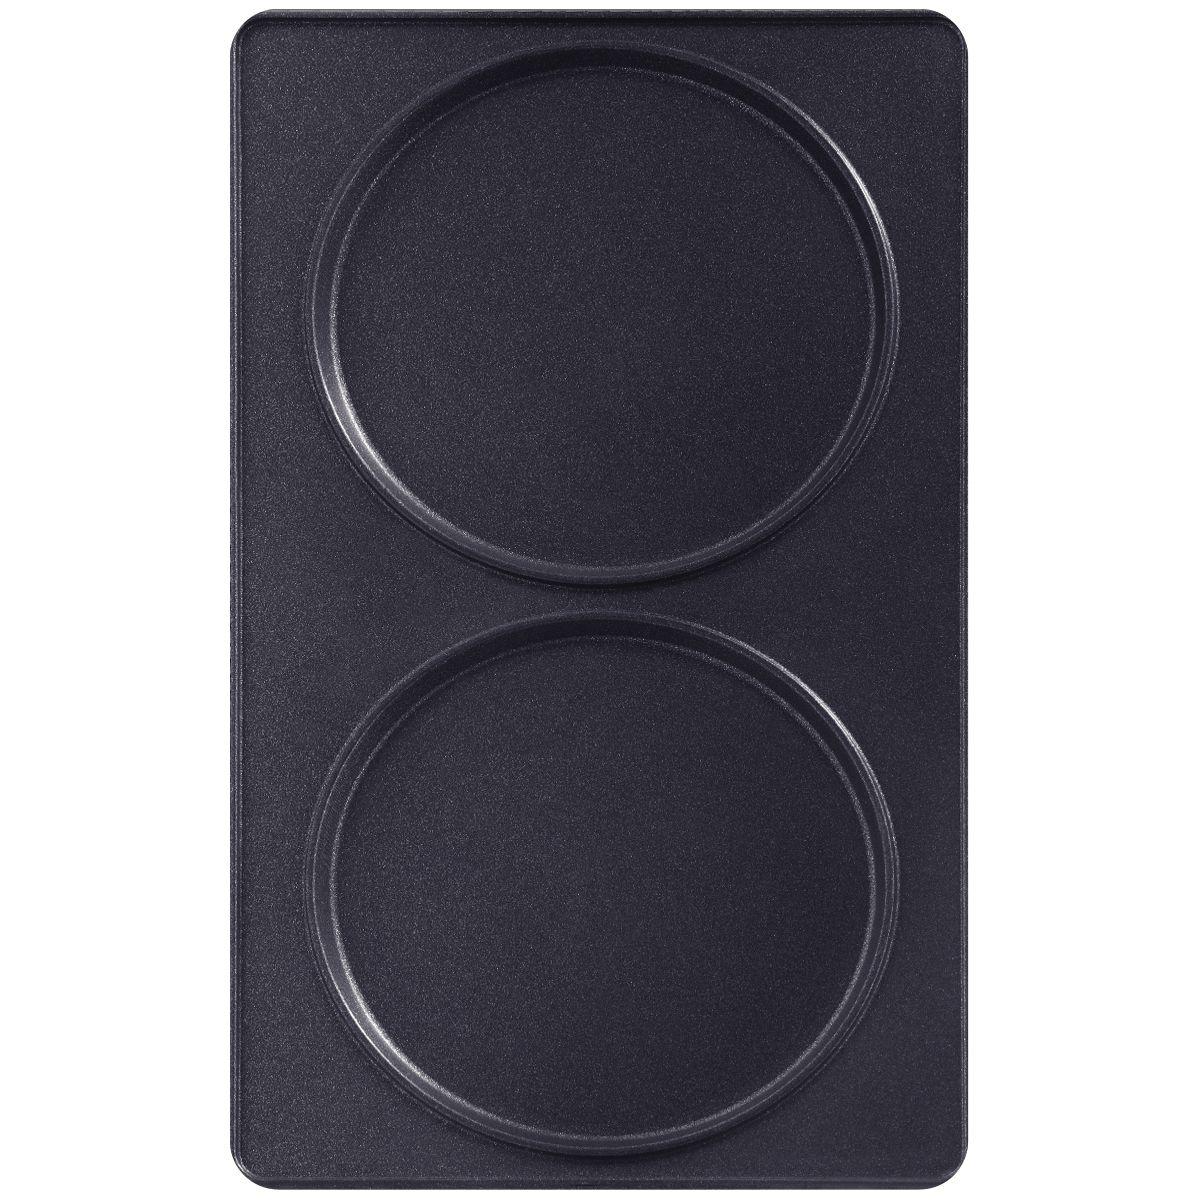 Accessoire grill TEFAL XA801012 2 plaques pancake (photo)